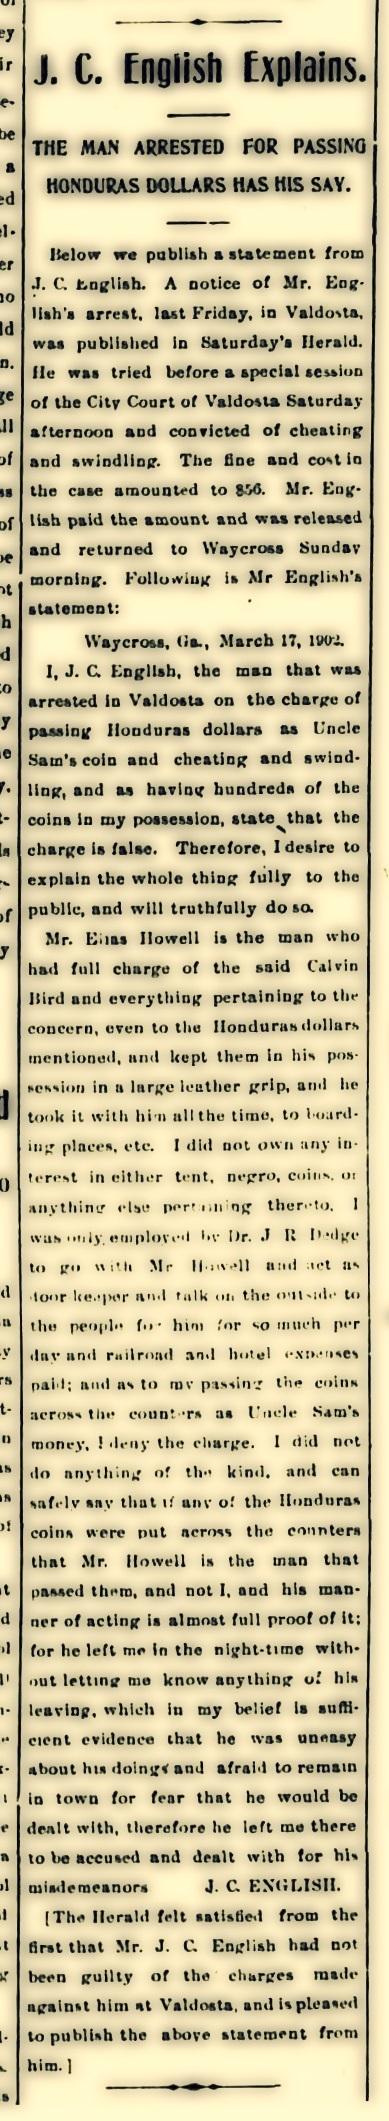 1902-mar-22-horned man-exposed-jc-english-explains